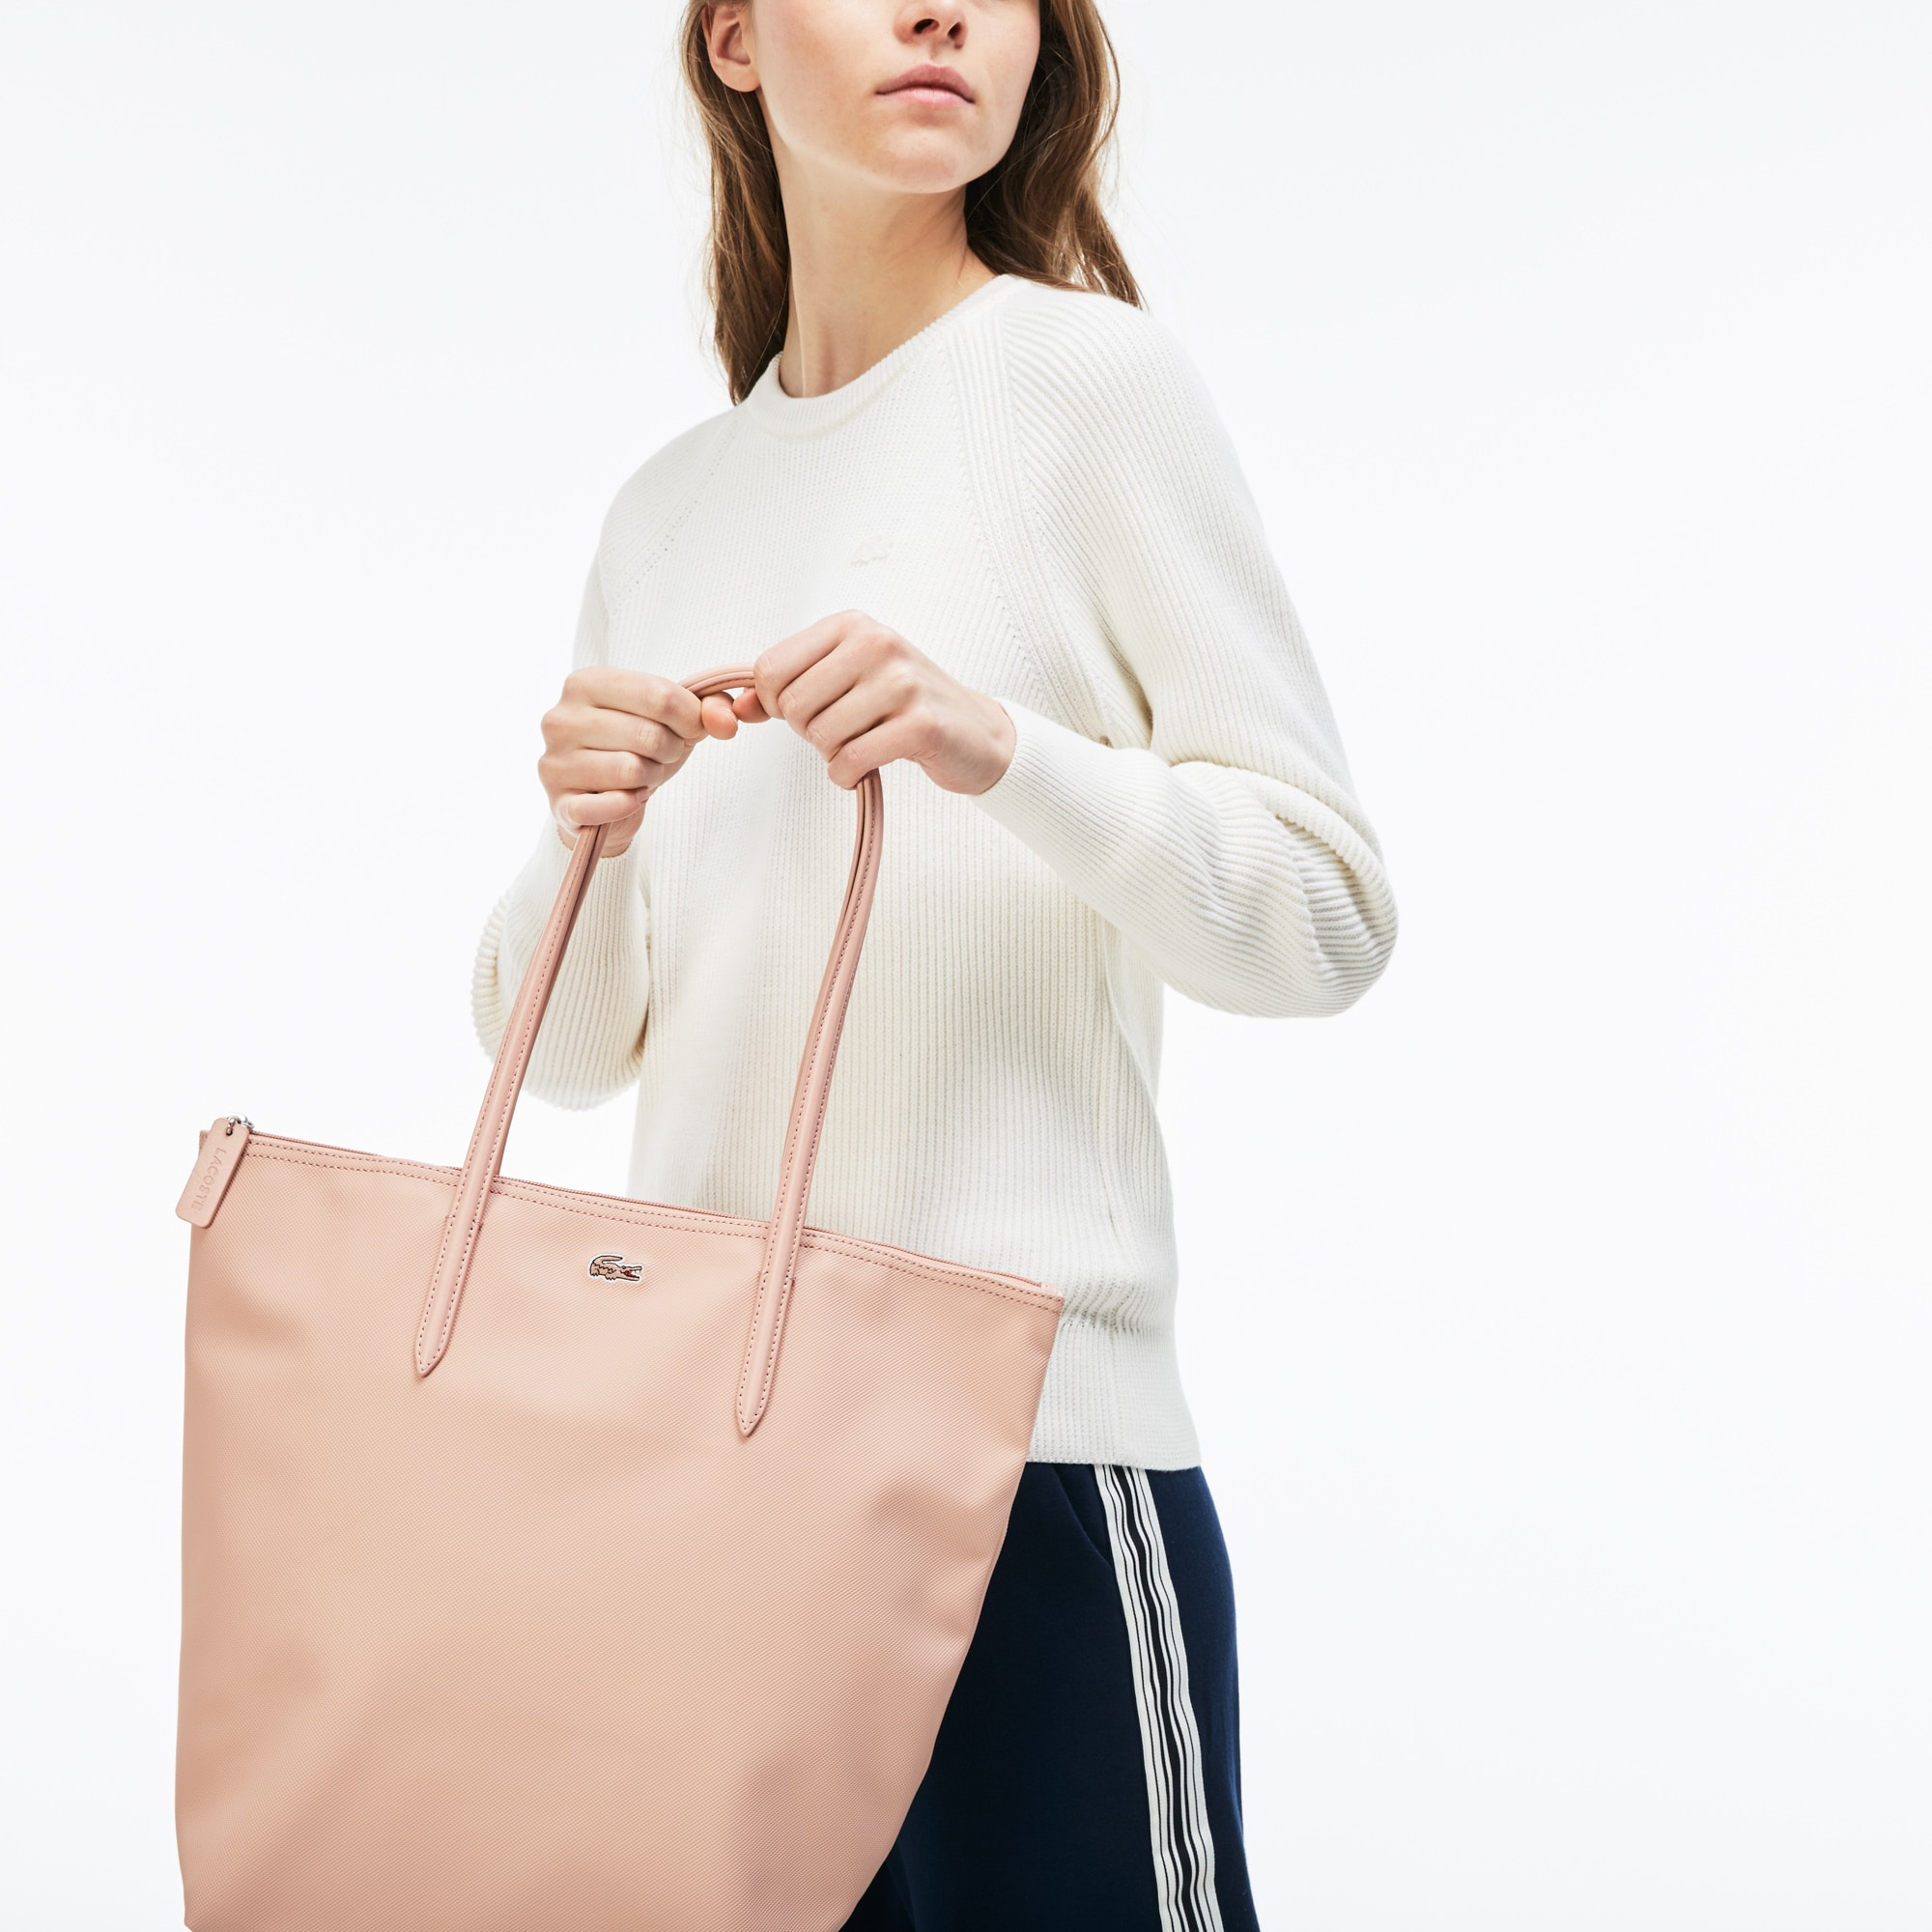 Shopping Bag Vertical L.12.12 Concept